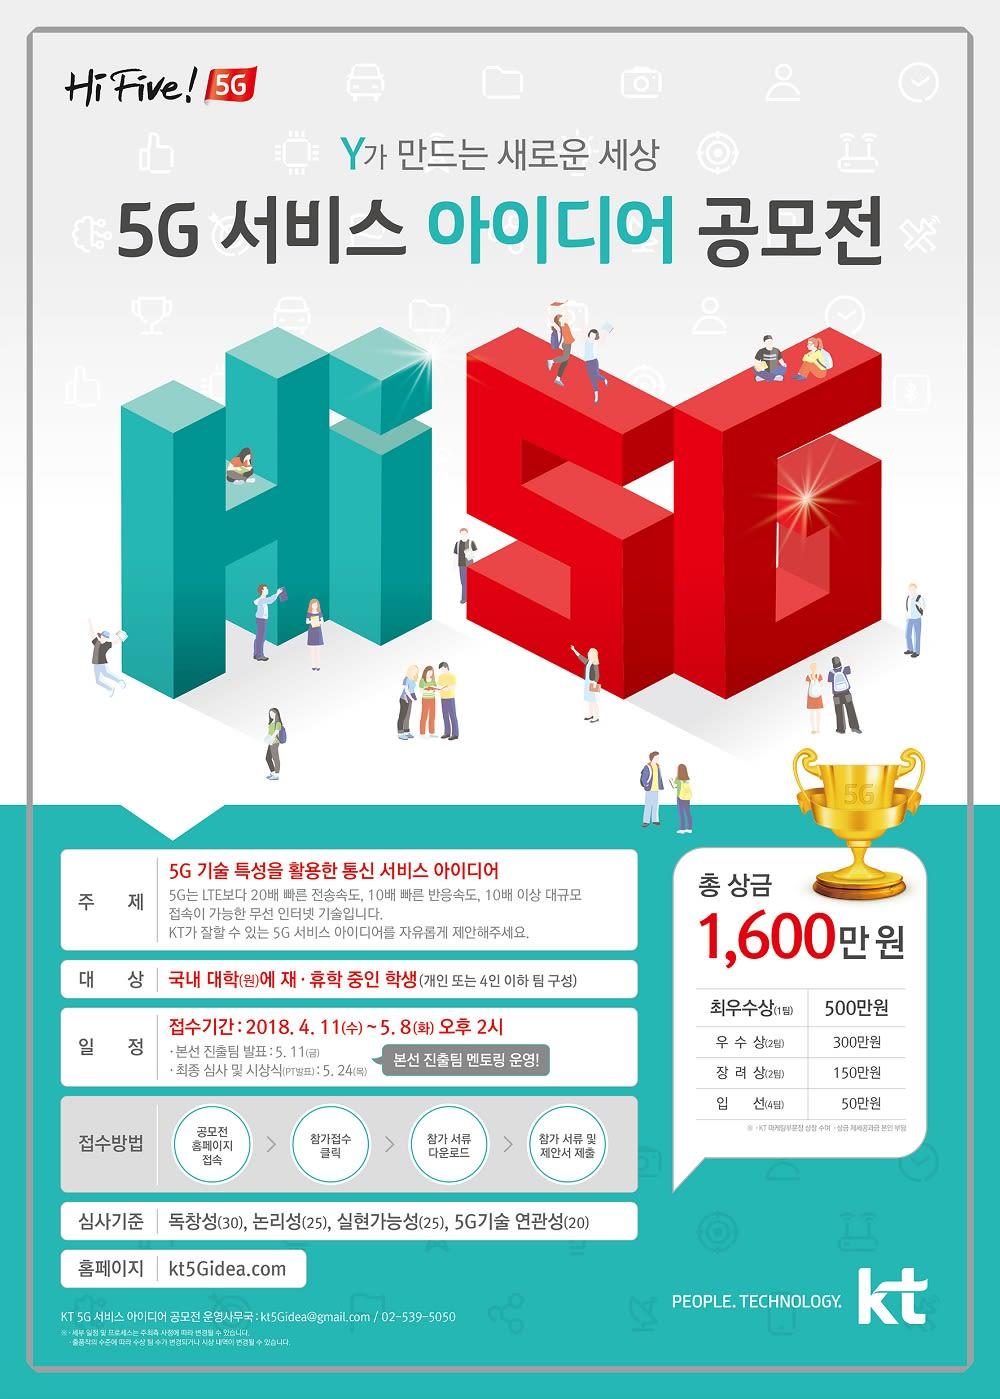 [KT그룹] KT 5G 서비스 아이디어 공모전